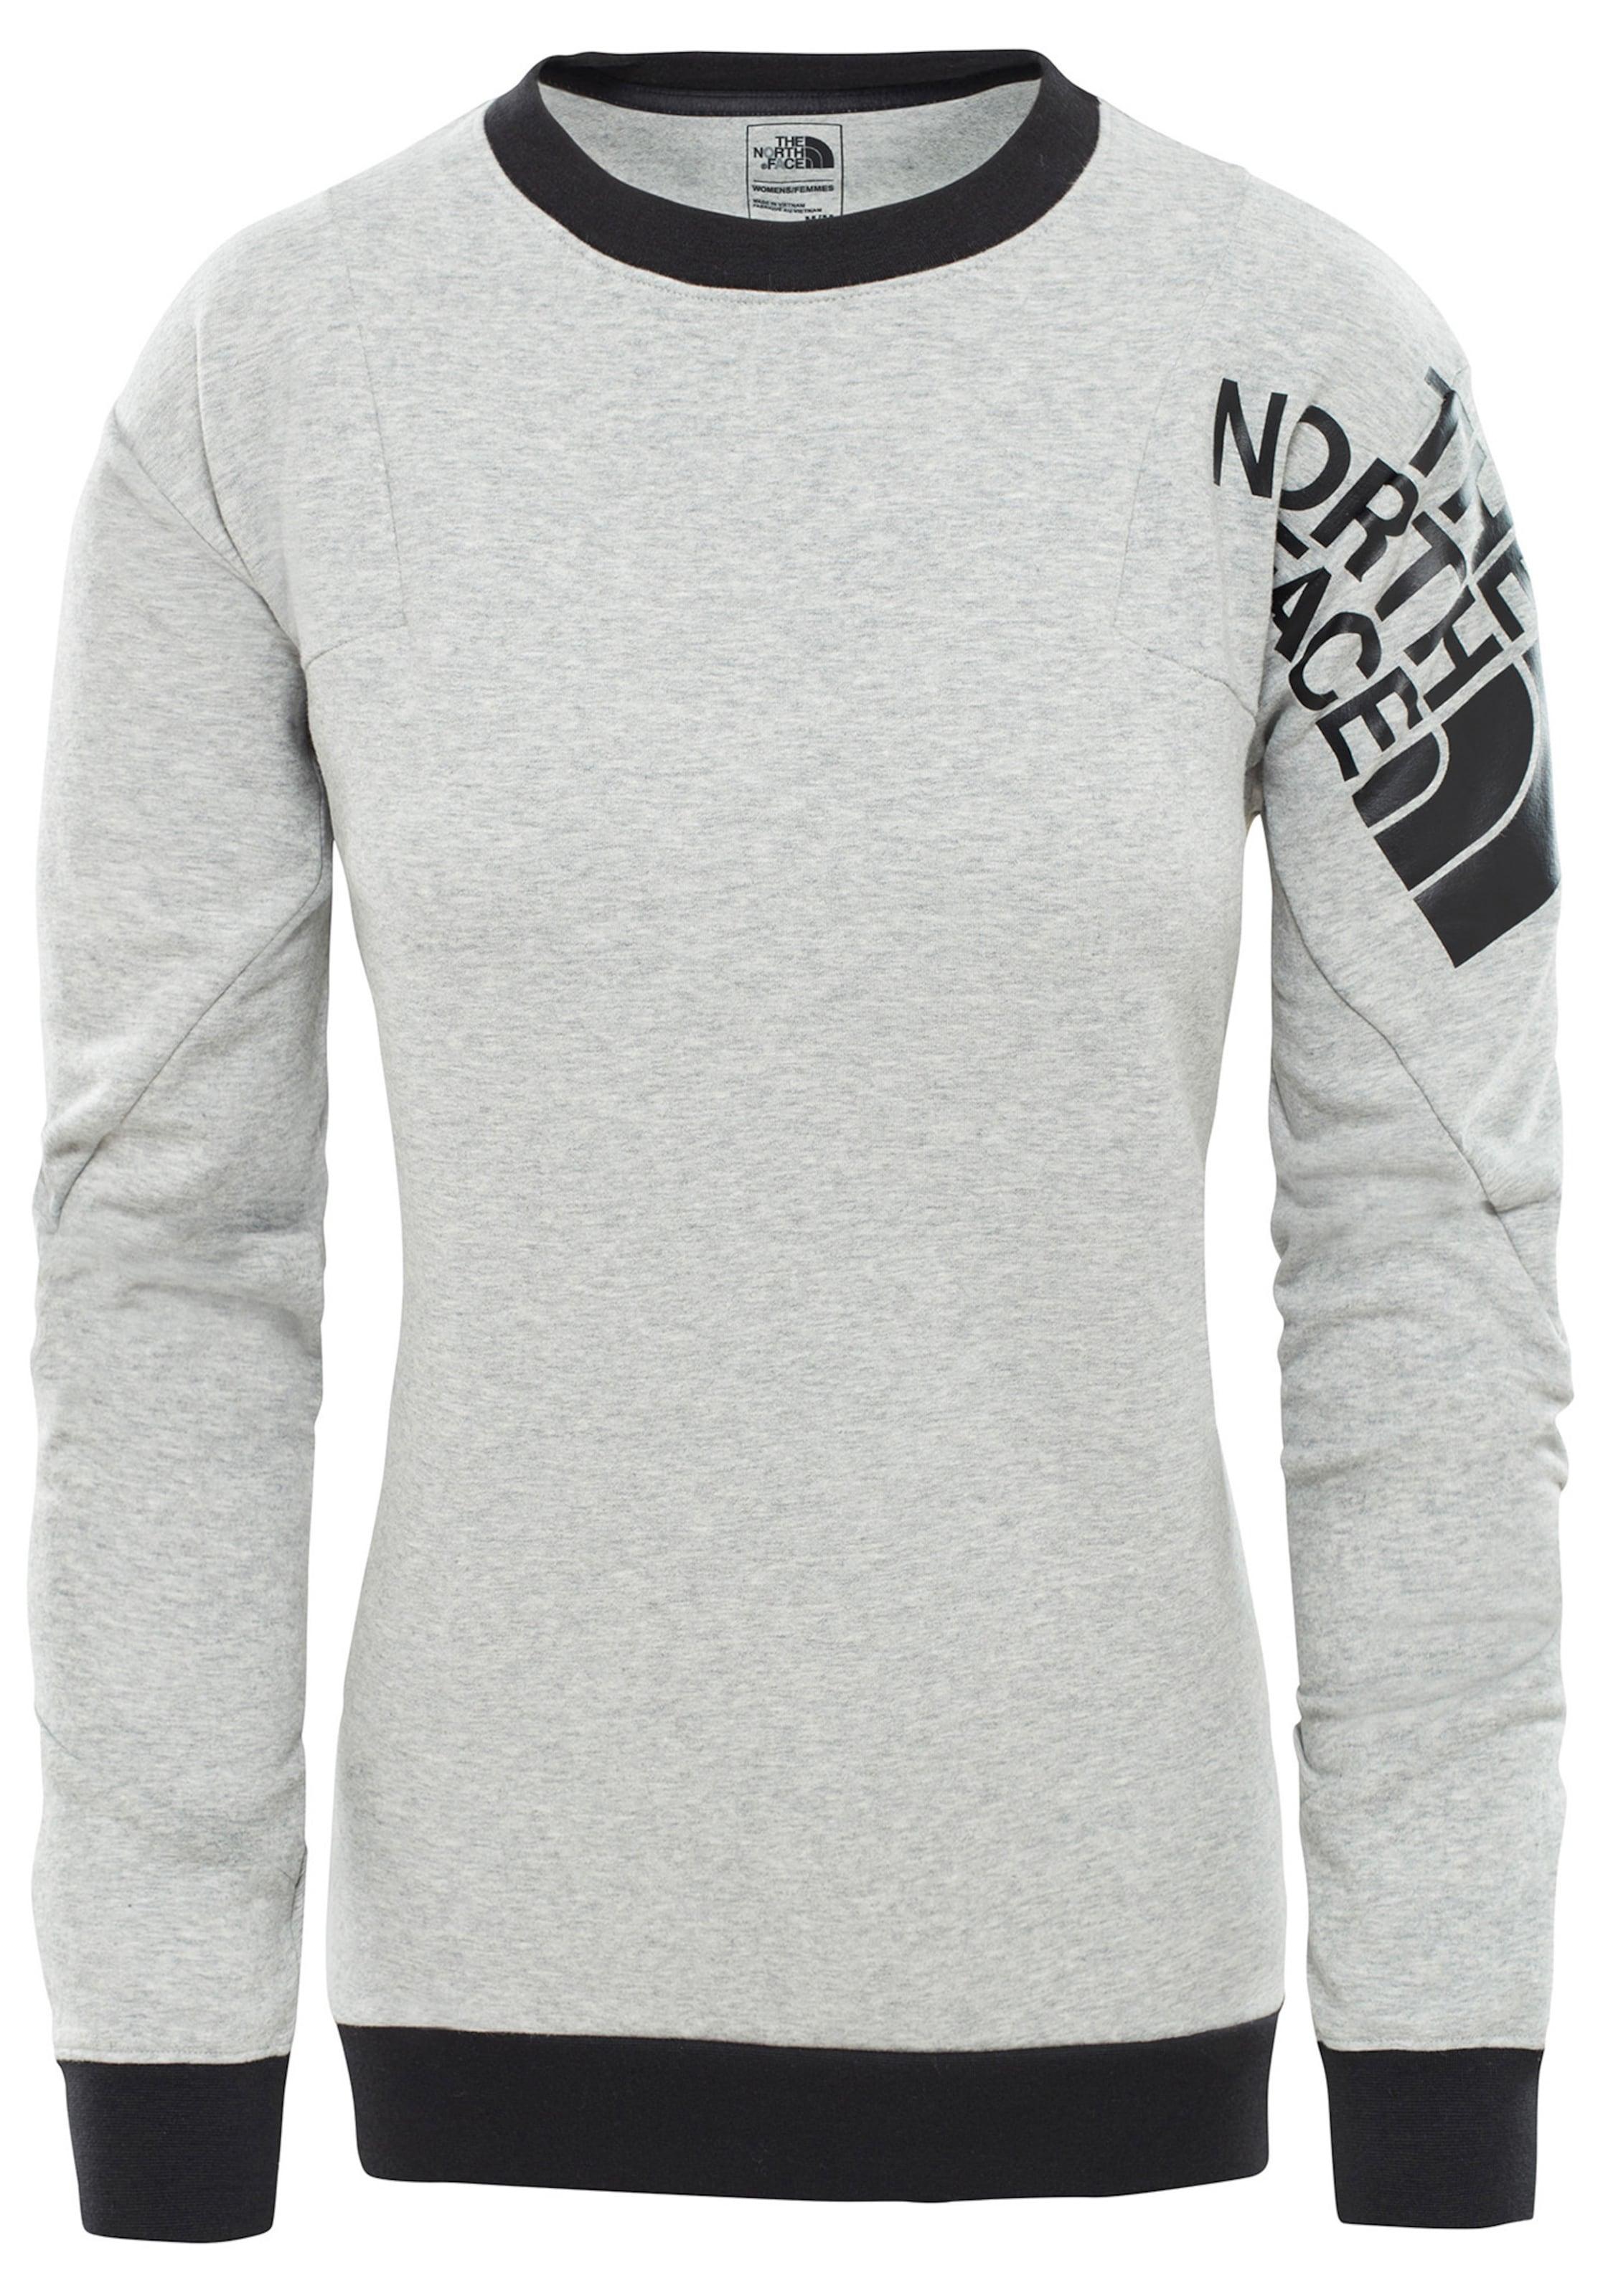 In GraumeliertSchwarz Sweatshirt The Face North Logo' 'train N XPZOkTiu